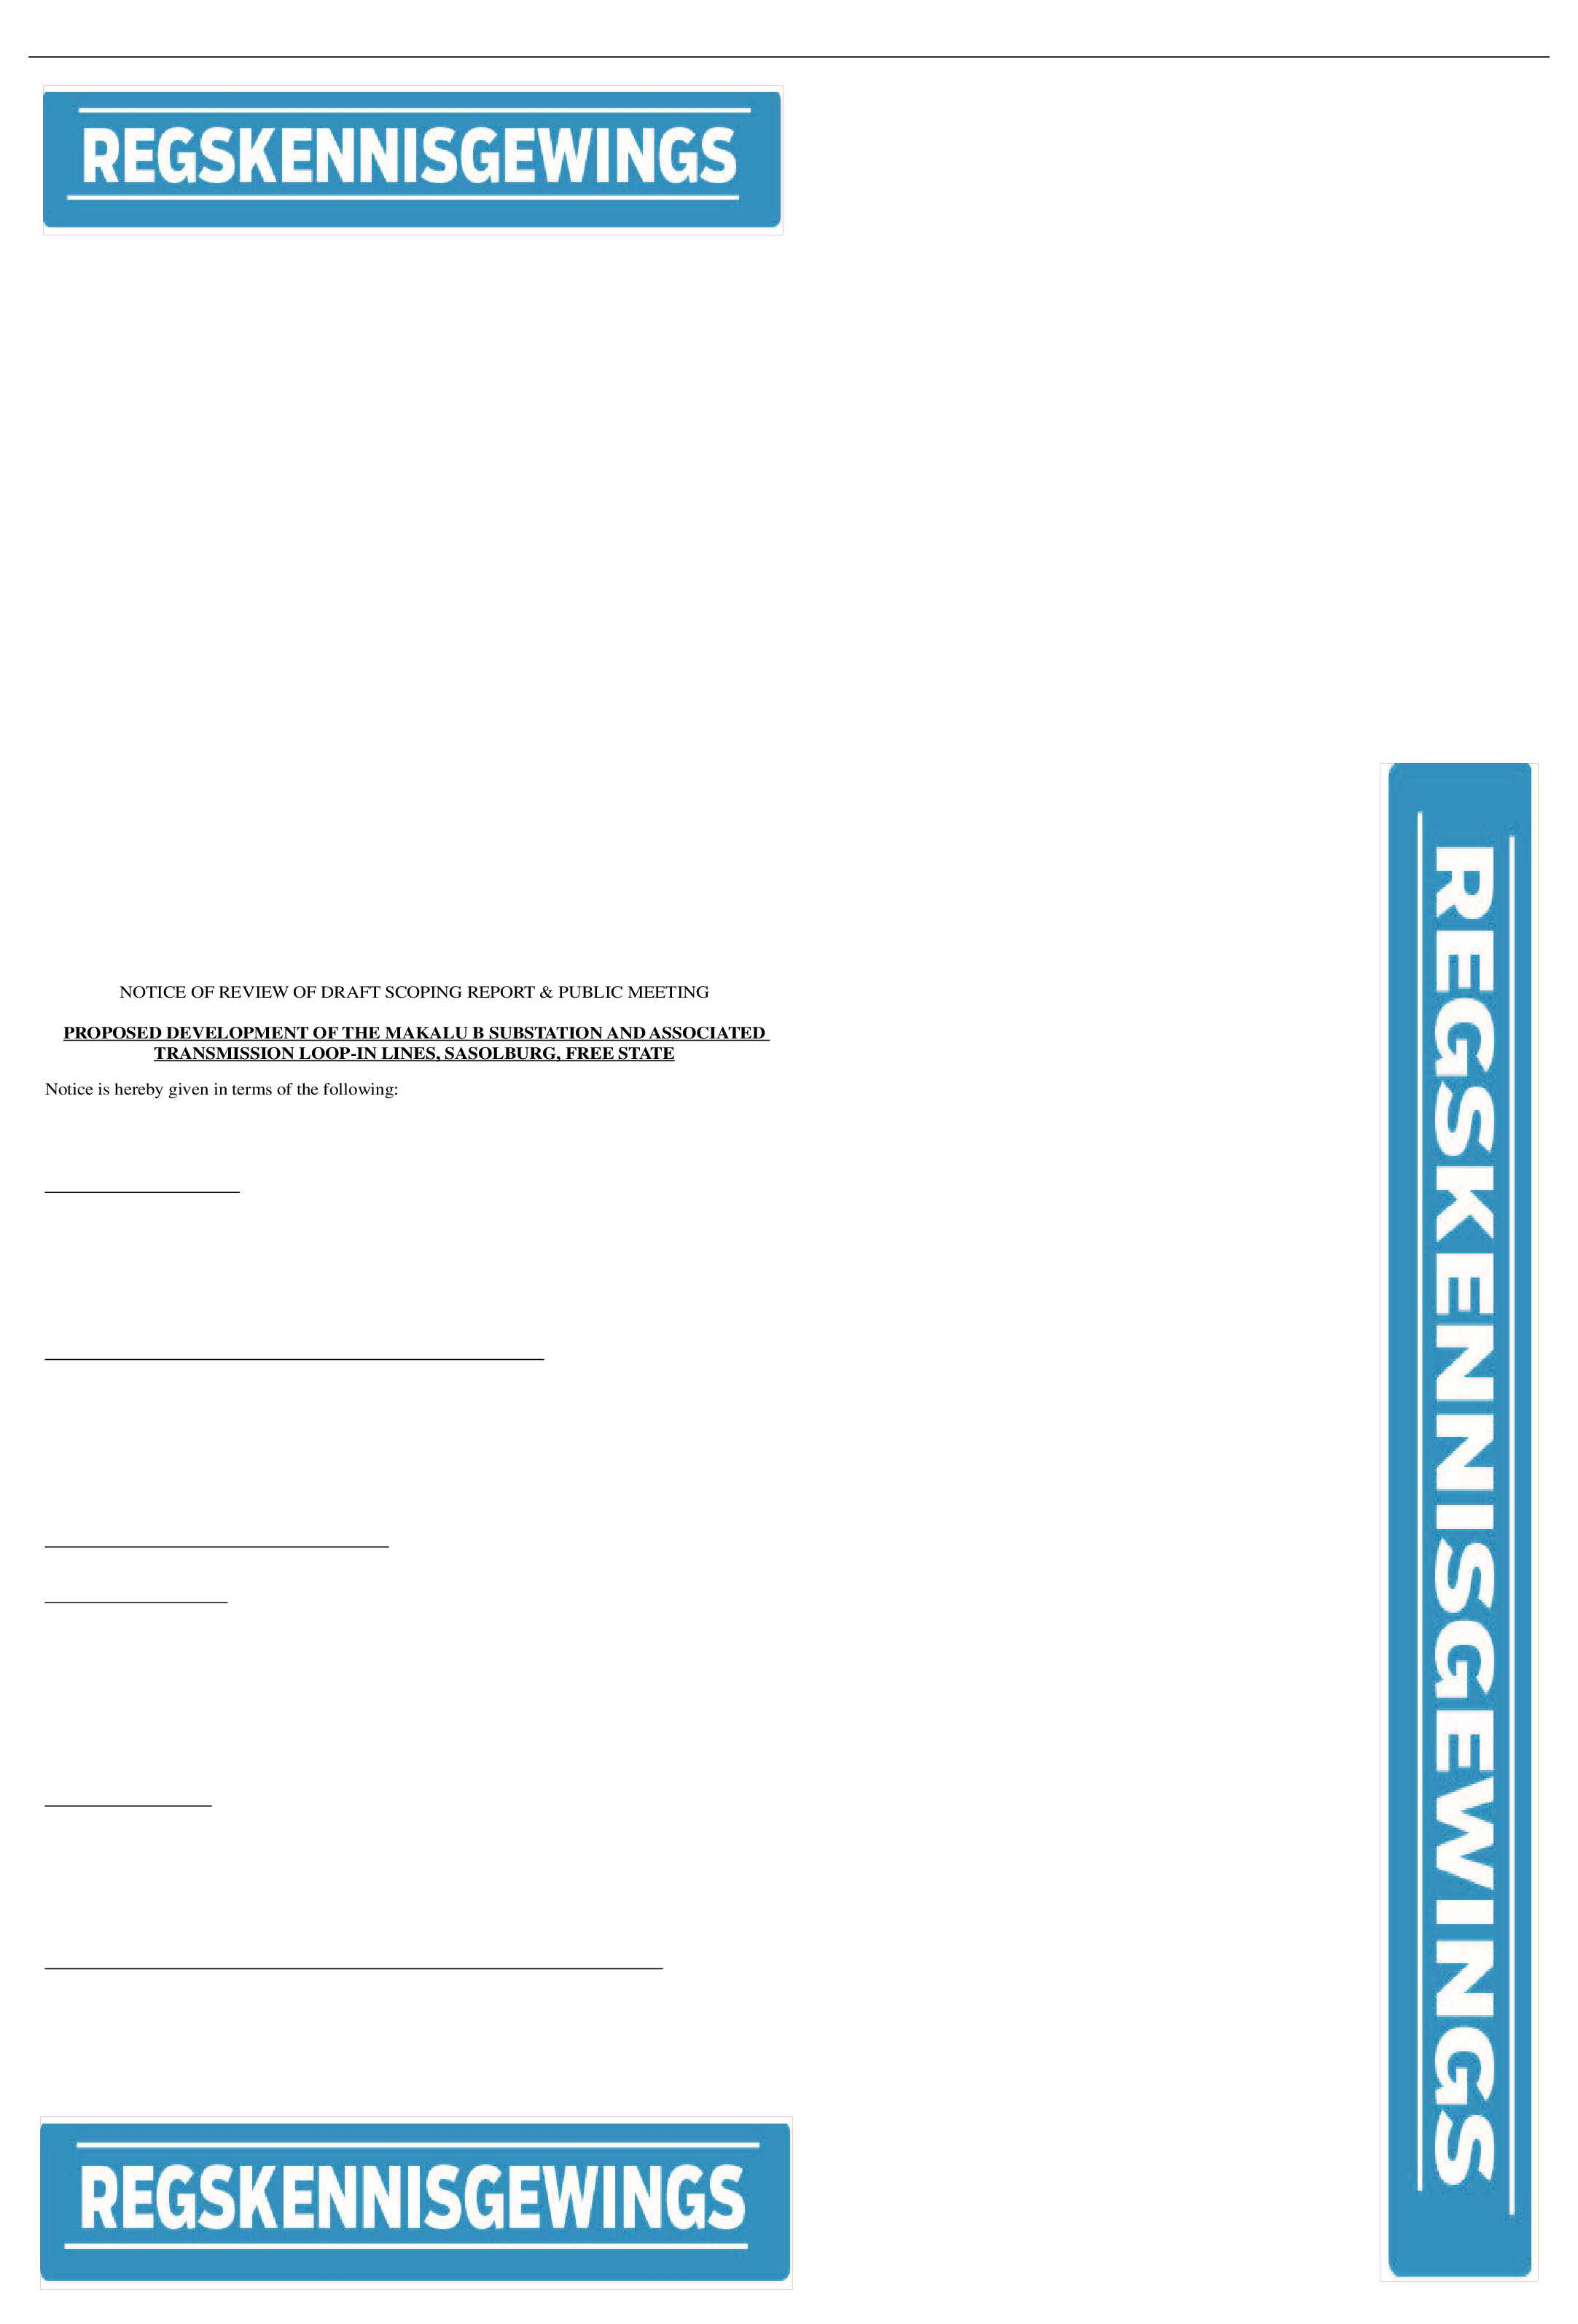 vereeniging-ster-16-22-mei-2017-epapers-page-14